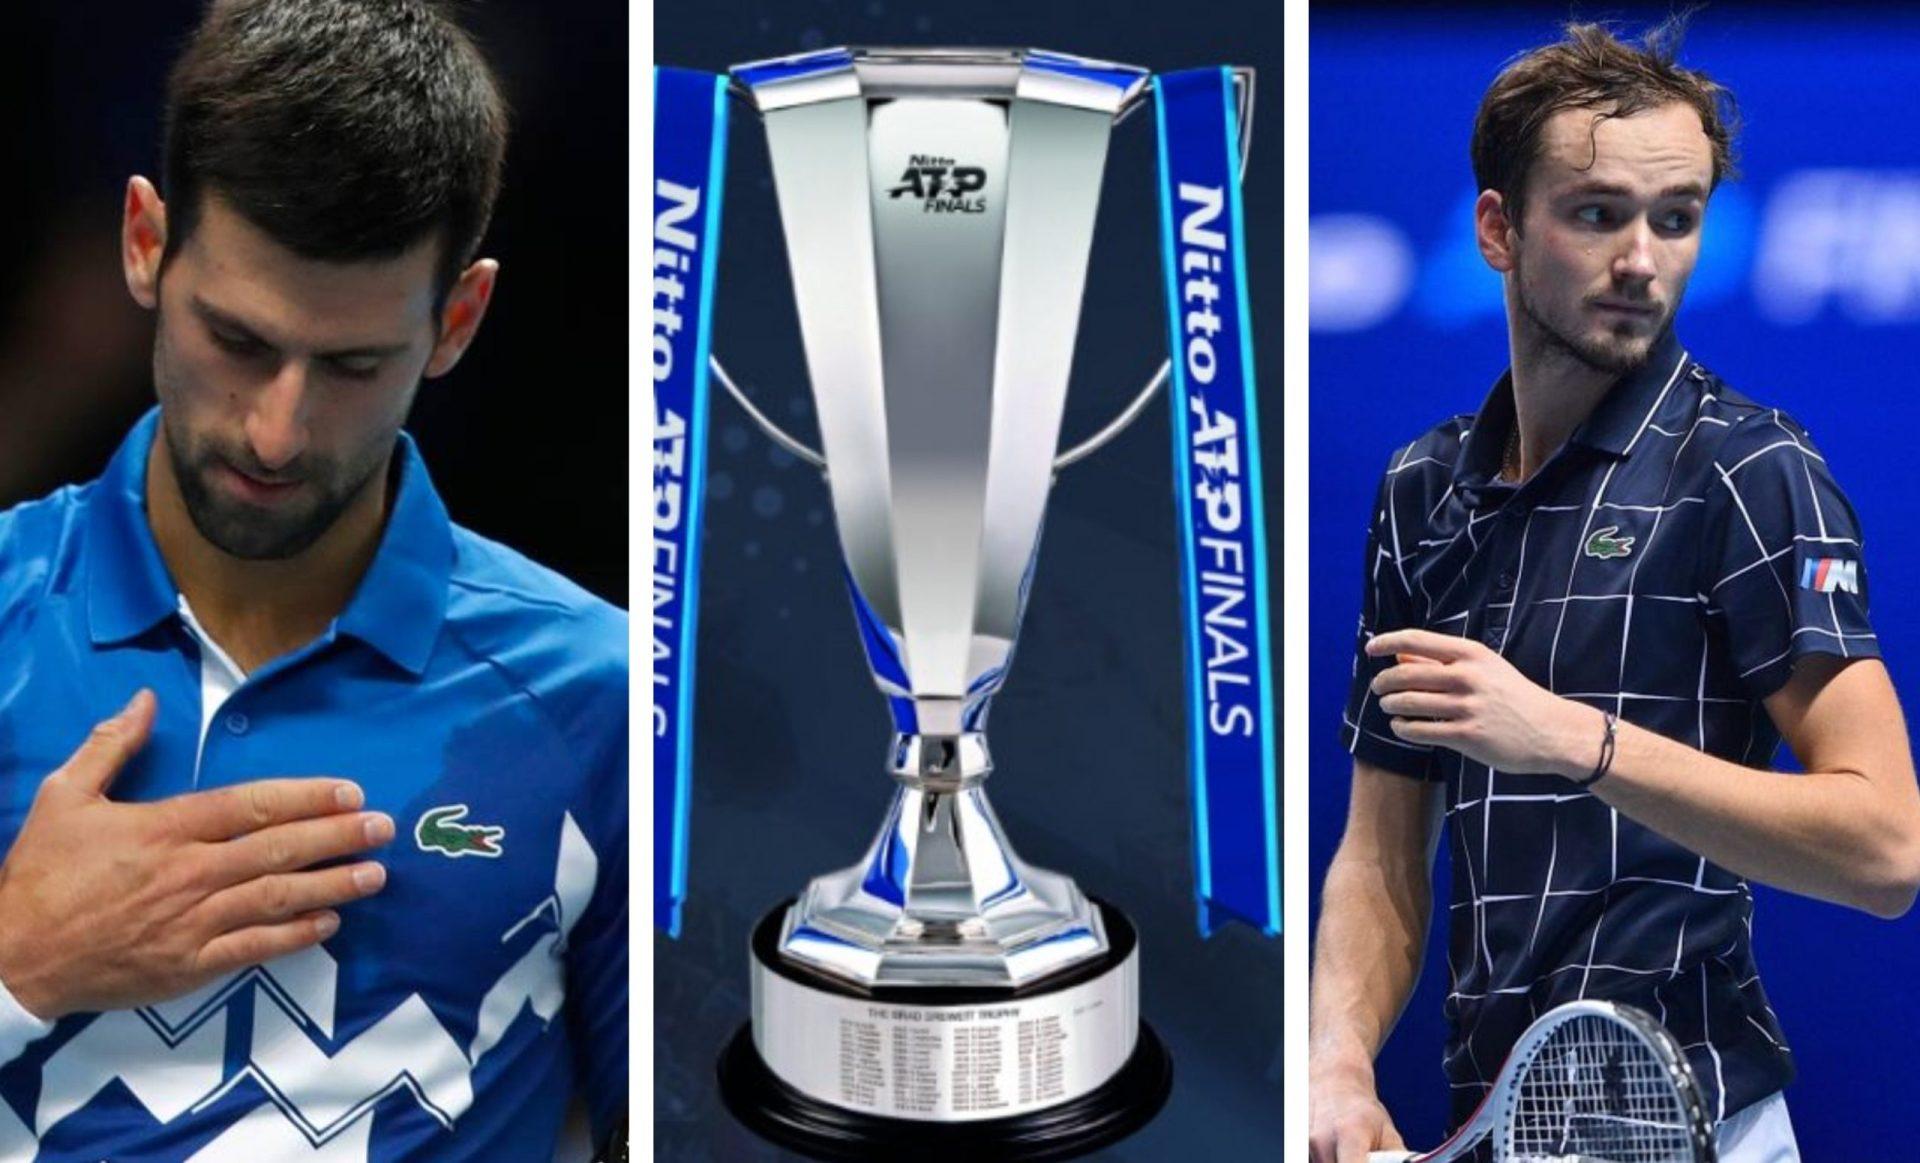 NextGen ascending-Mighty Medvedev breaks the Djoker juggernaught in ATP Finals - THE SPORTS ROOM